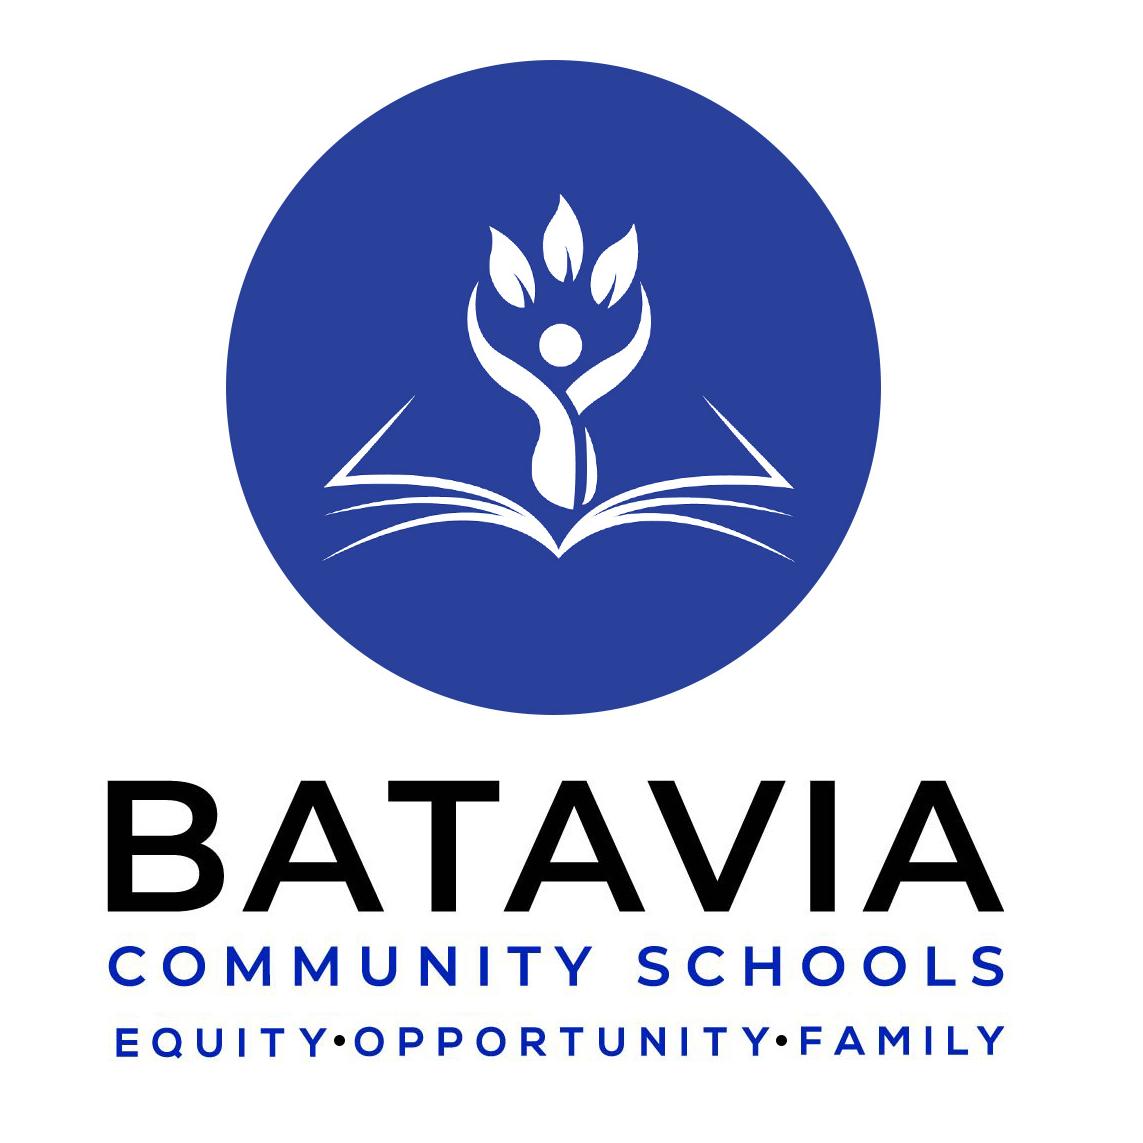 Batavia Community Schools logo